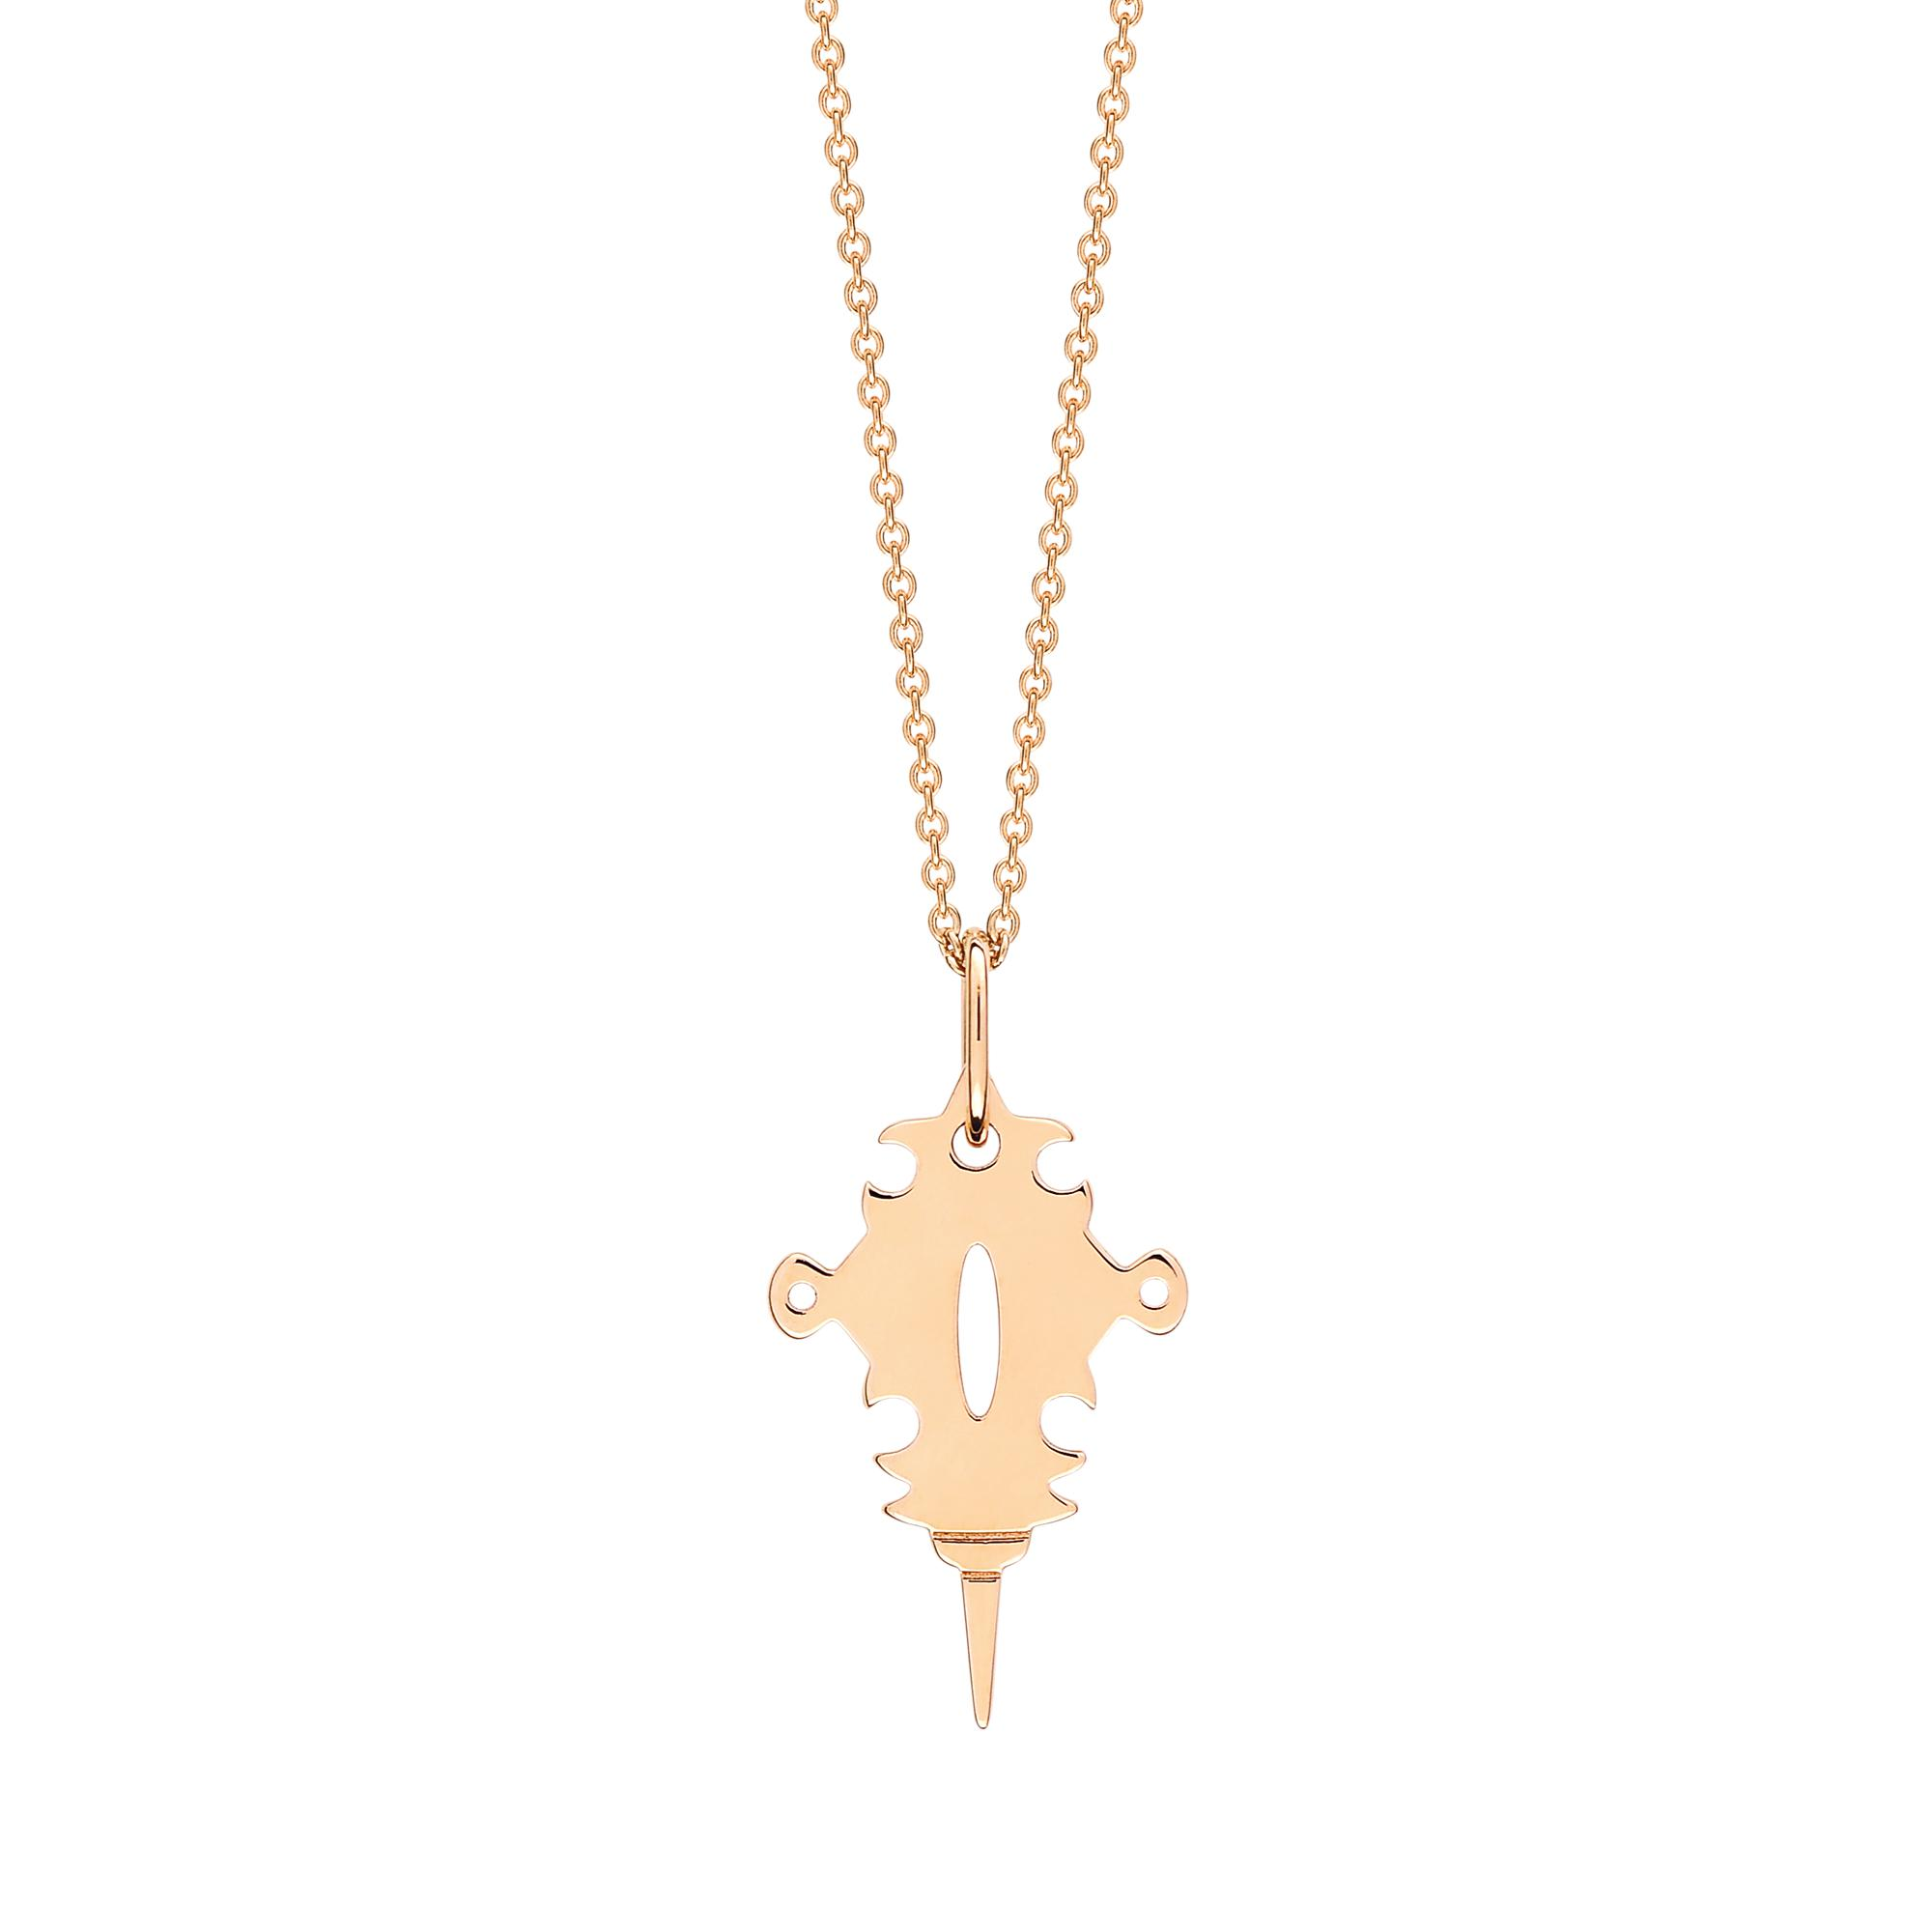 Ginette NY Mini Tanger 18-karat rose gold necklace qI5JaCld